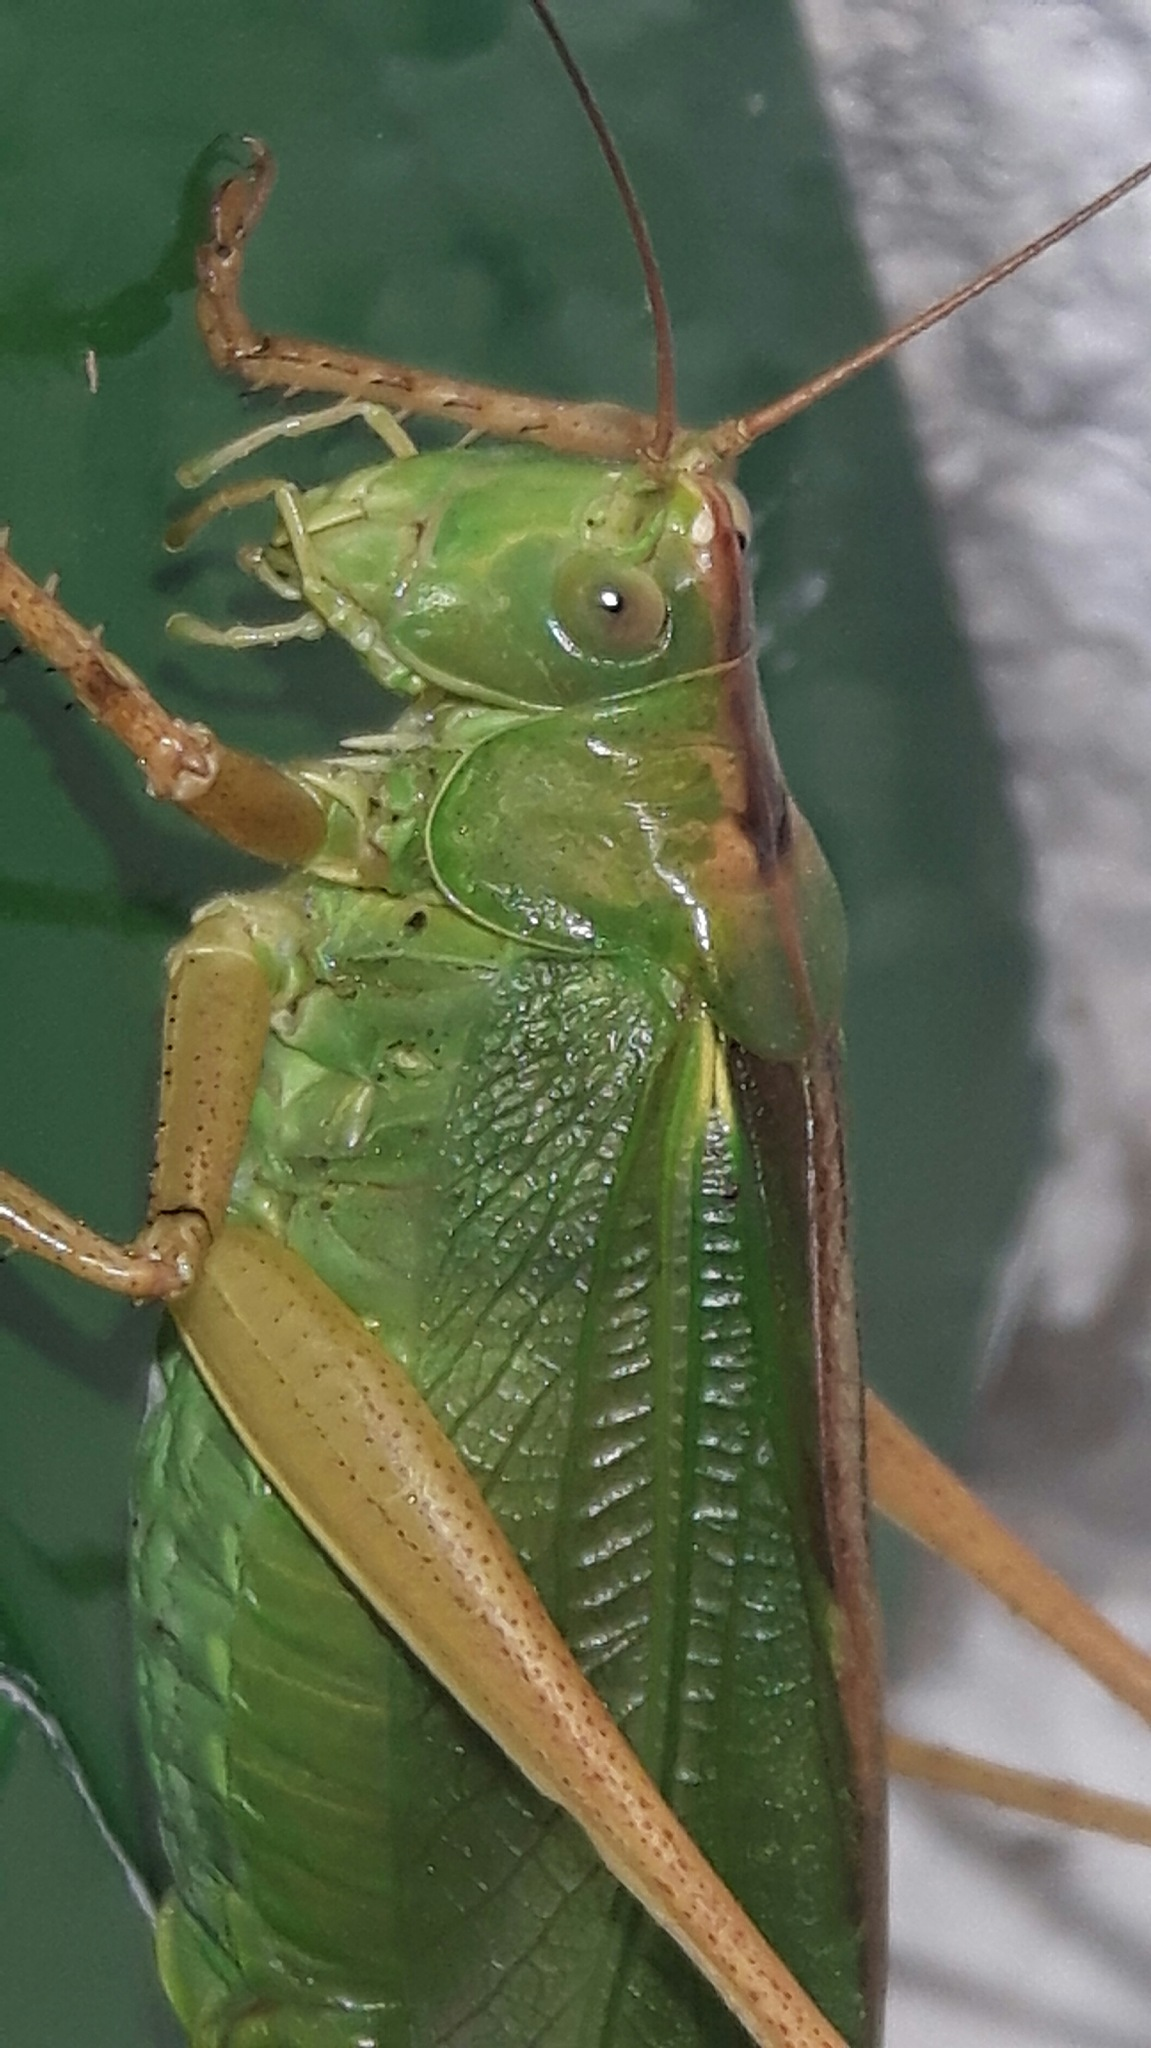 Beauty of a green grasshopper by Mevludin_Hasanovic